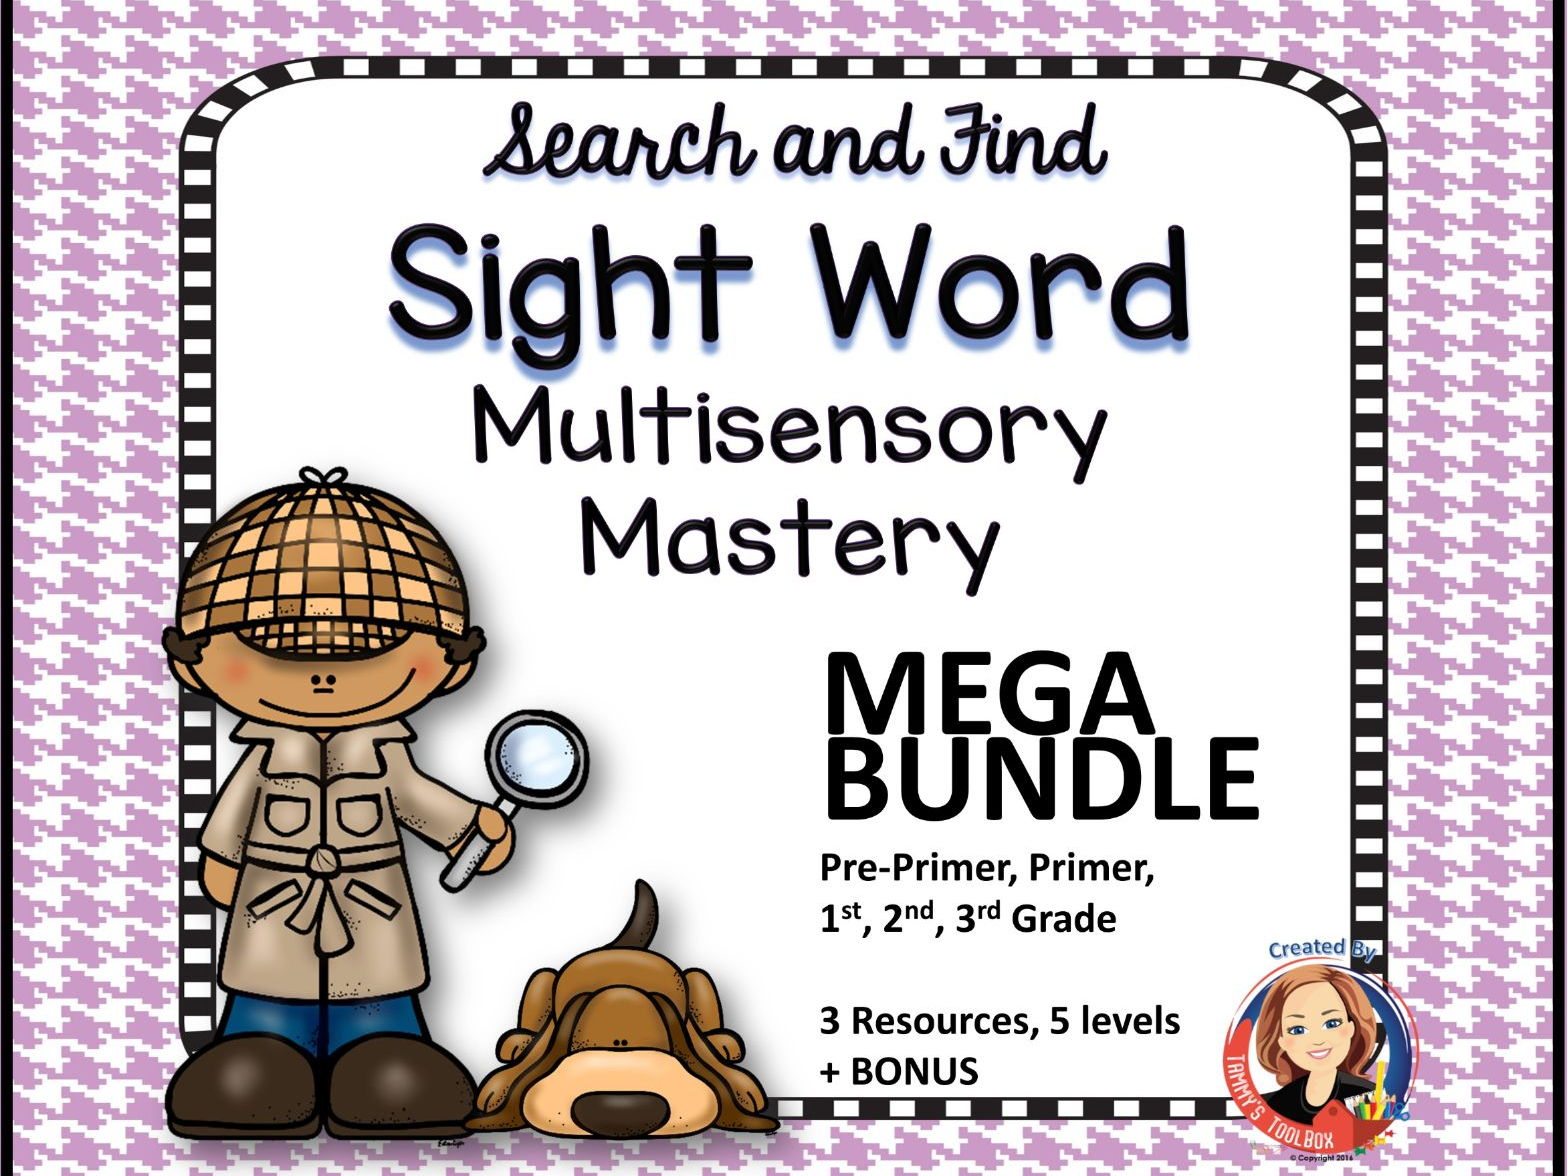 Sight Word Multi-Sensory Mastery Bundle